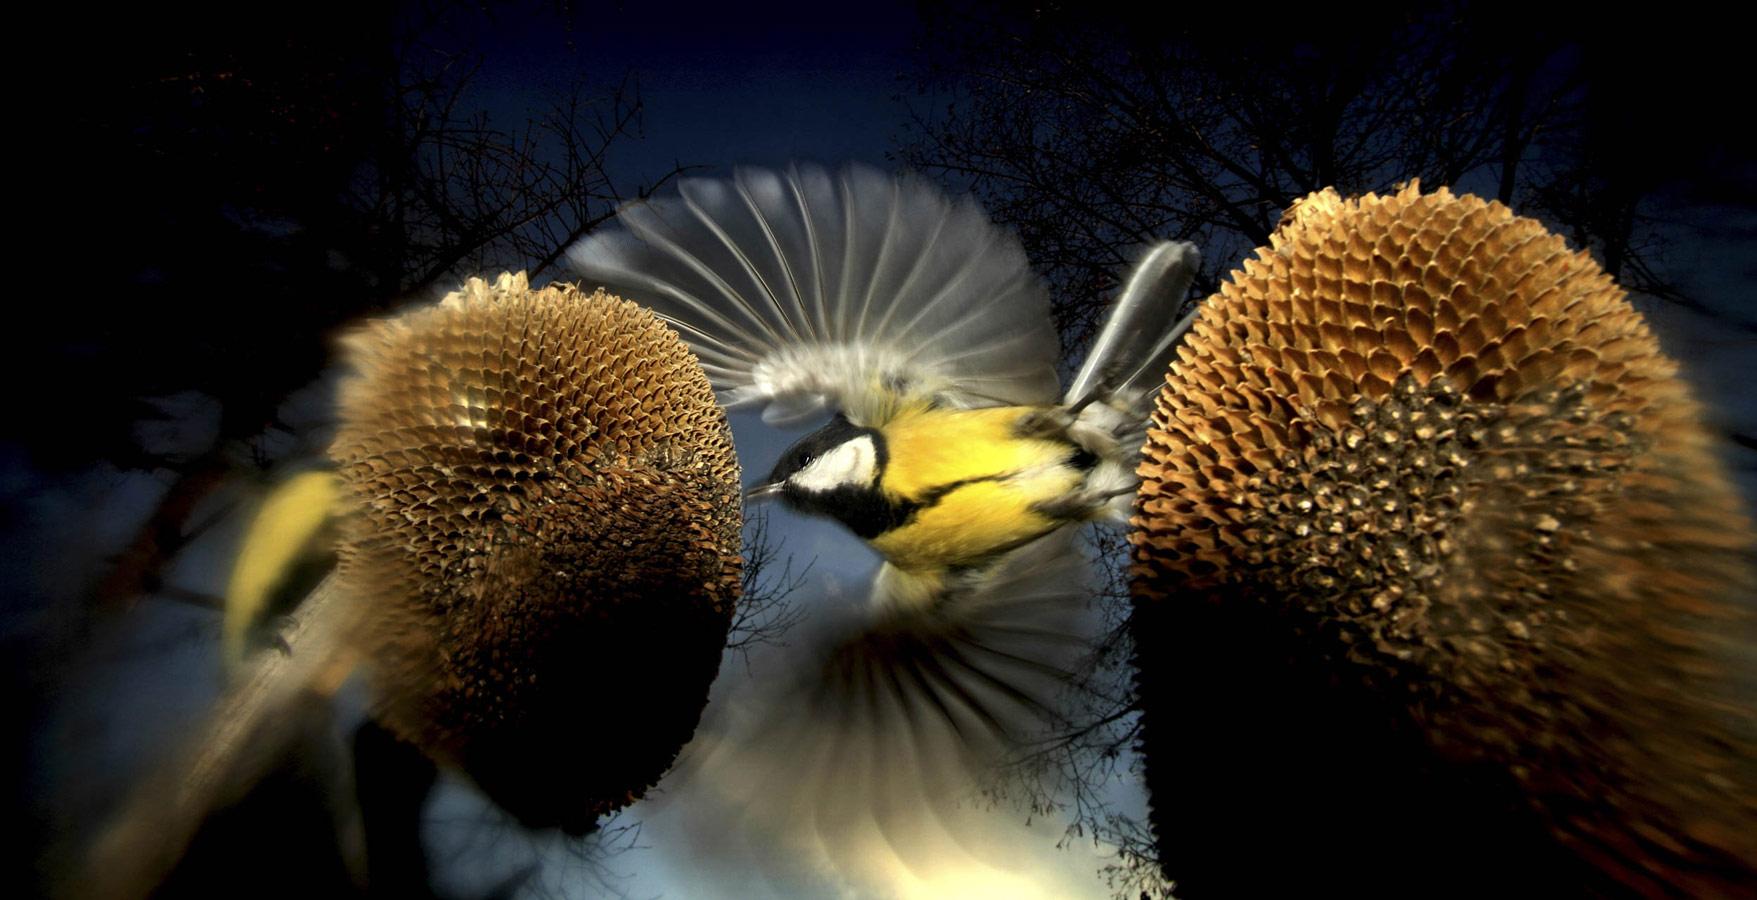 © Ritzel Zoltán, Birds & Bats Award, Oasis Photo Contest — International Award of Wildlife Photography